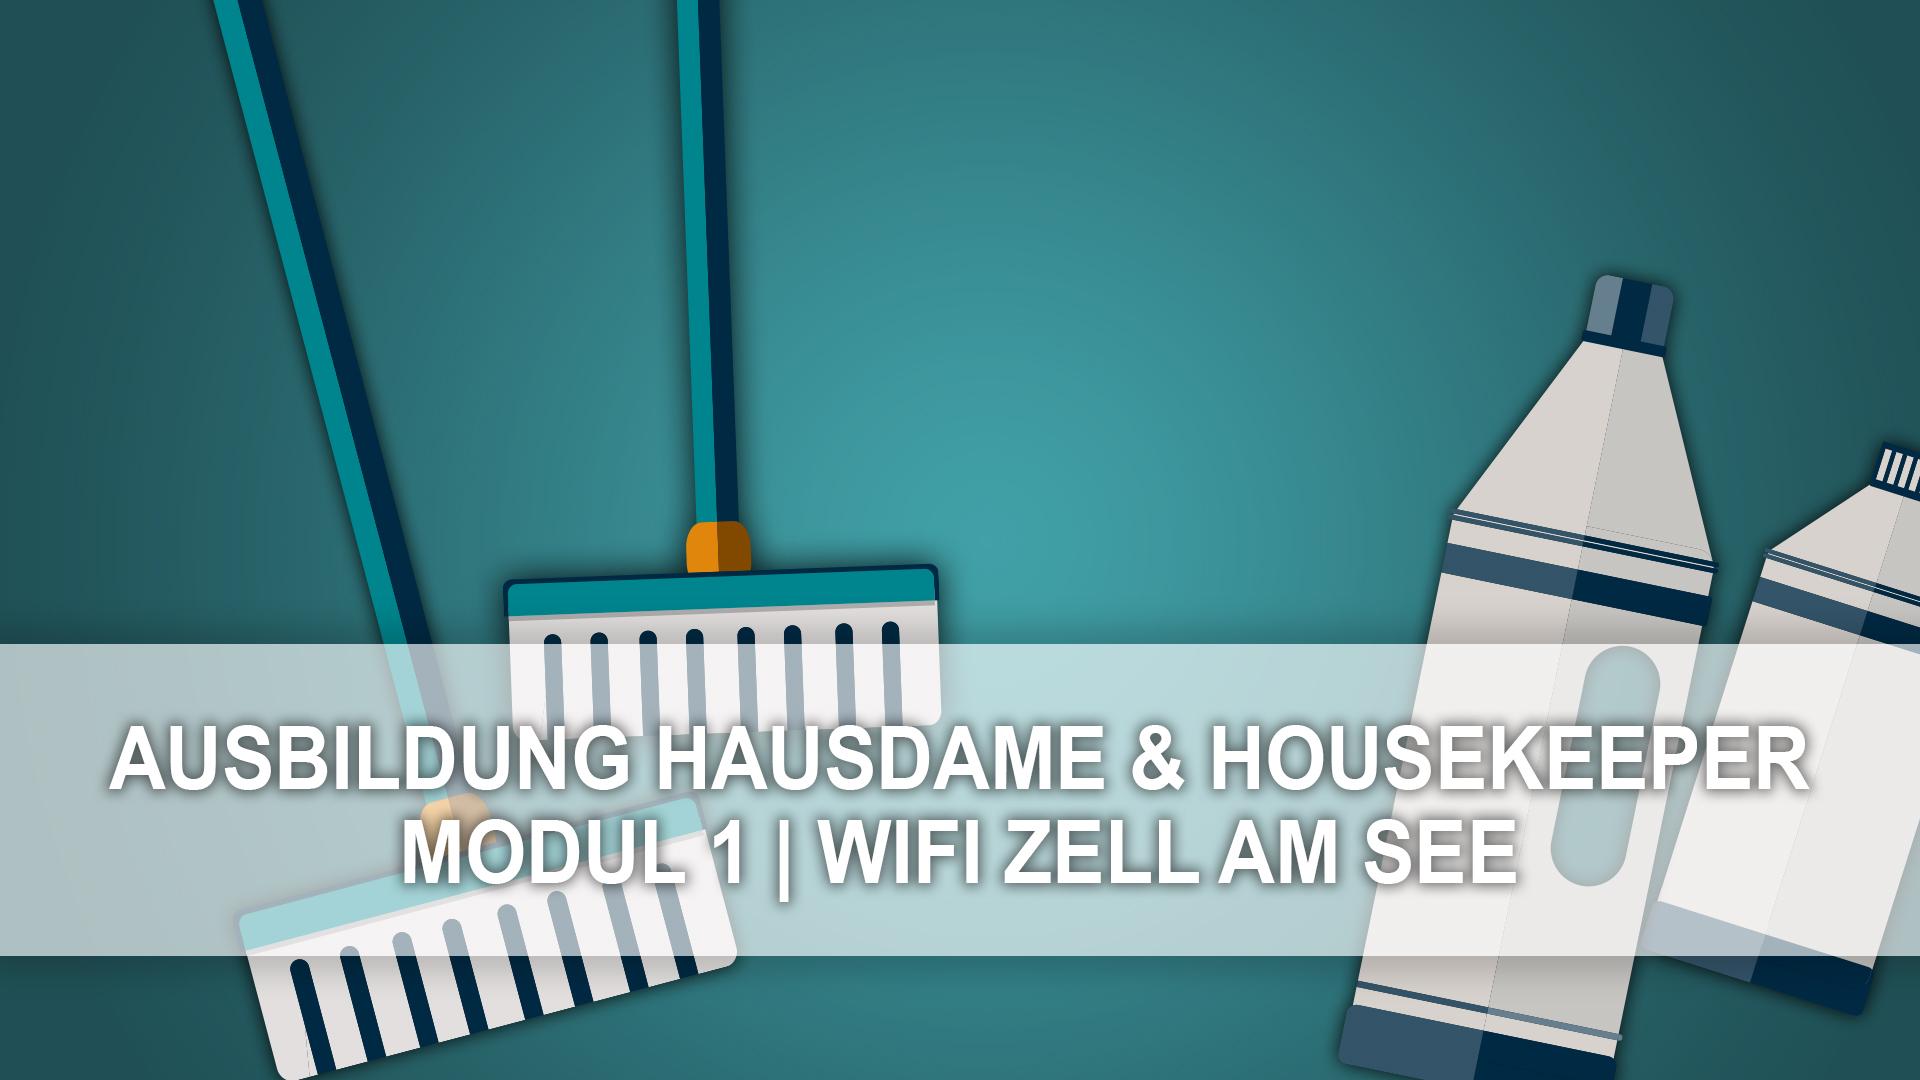 Ausbildung Hausdame und Housekeeper - Modul 1 am WIFI Zell am See ...